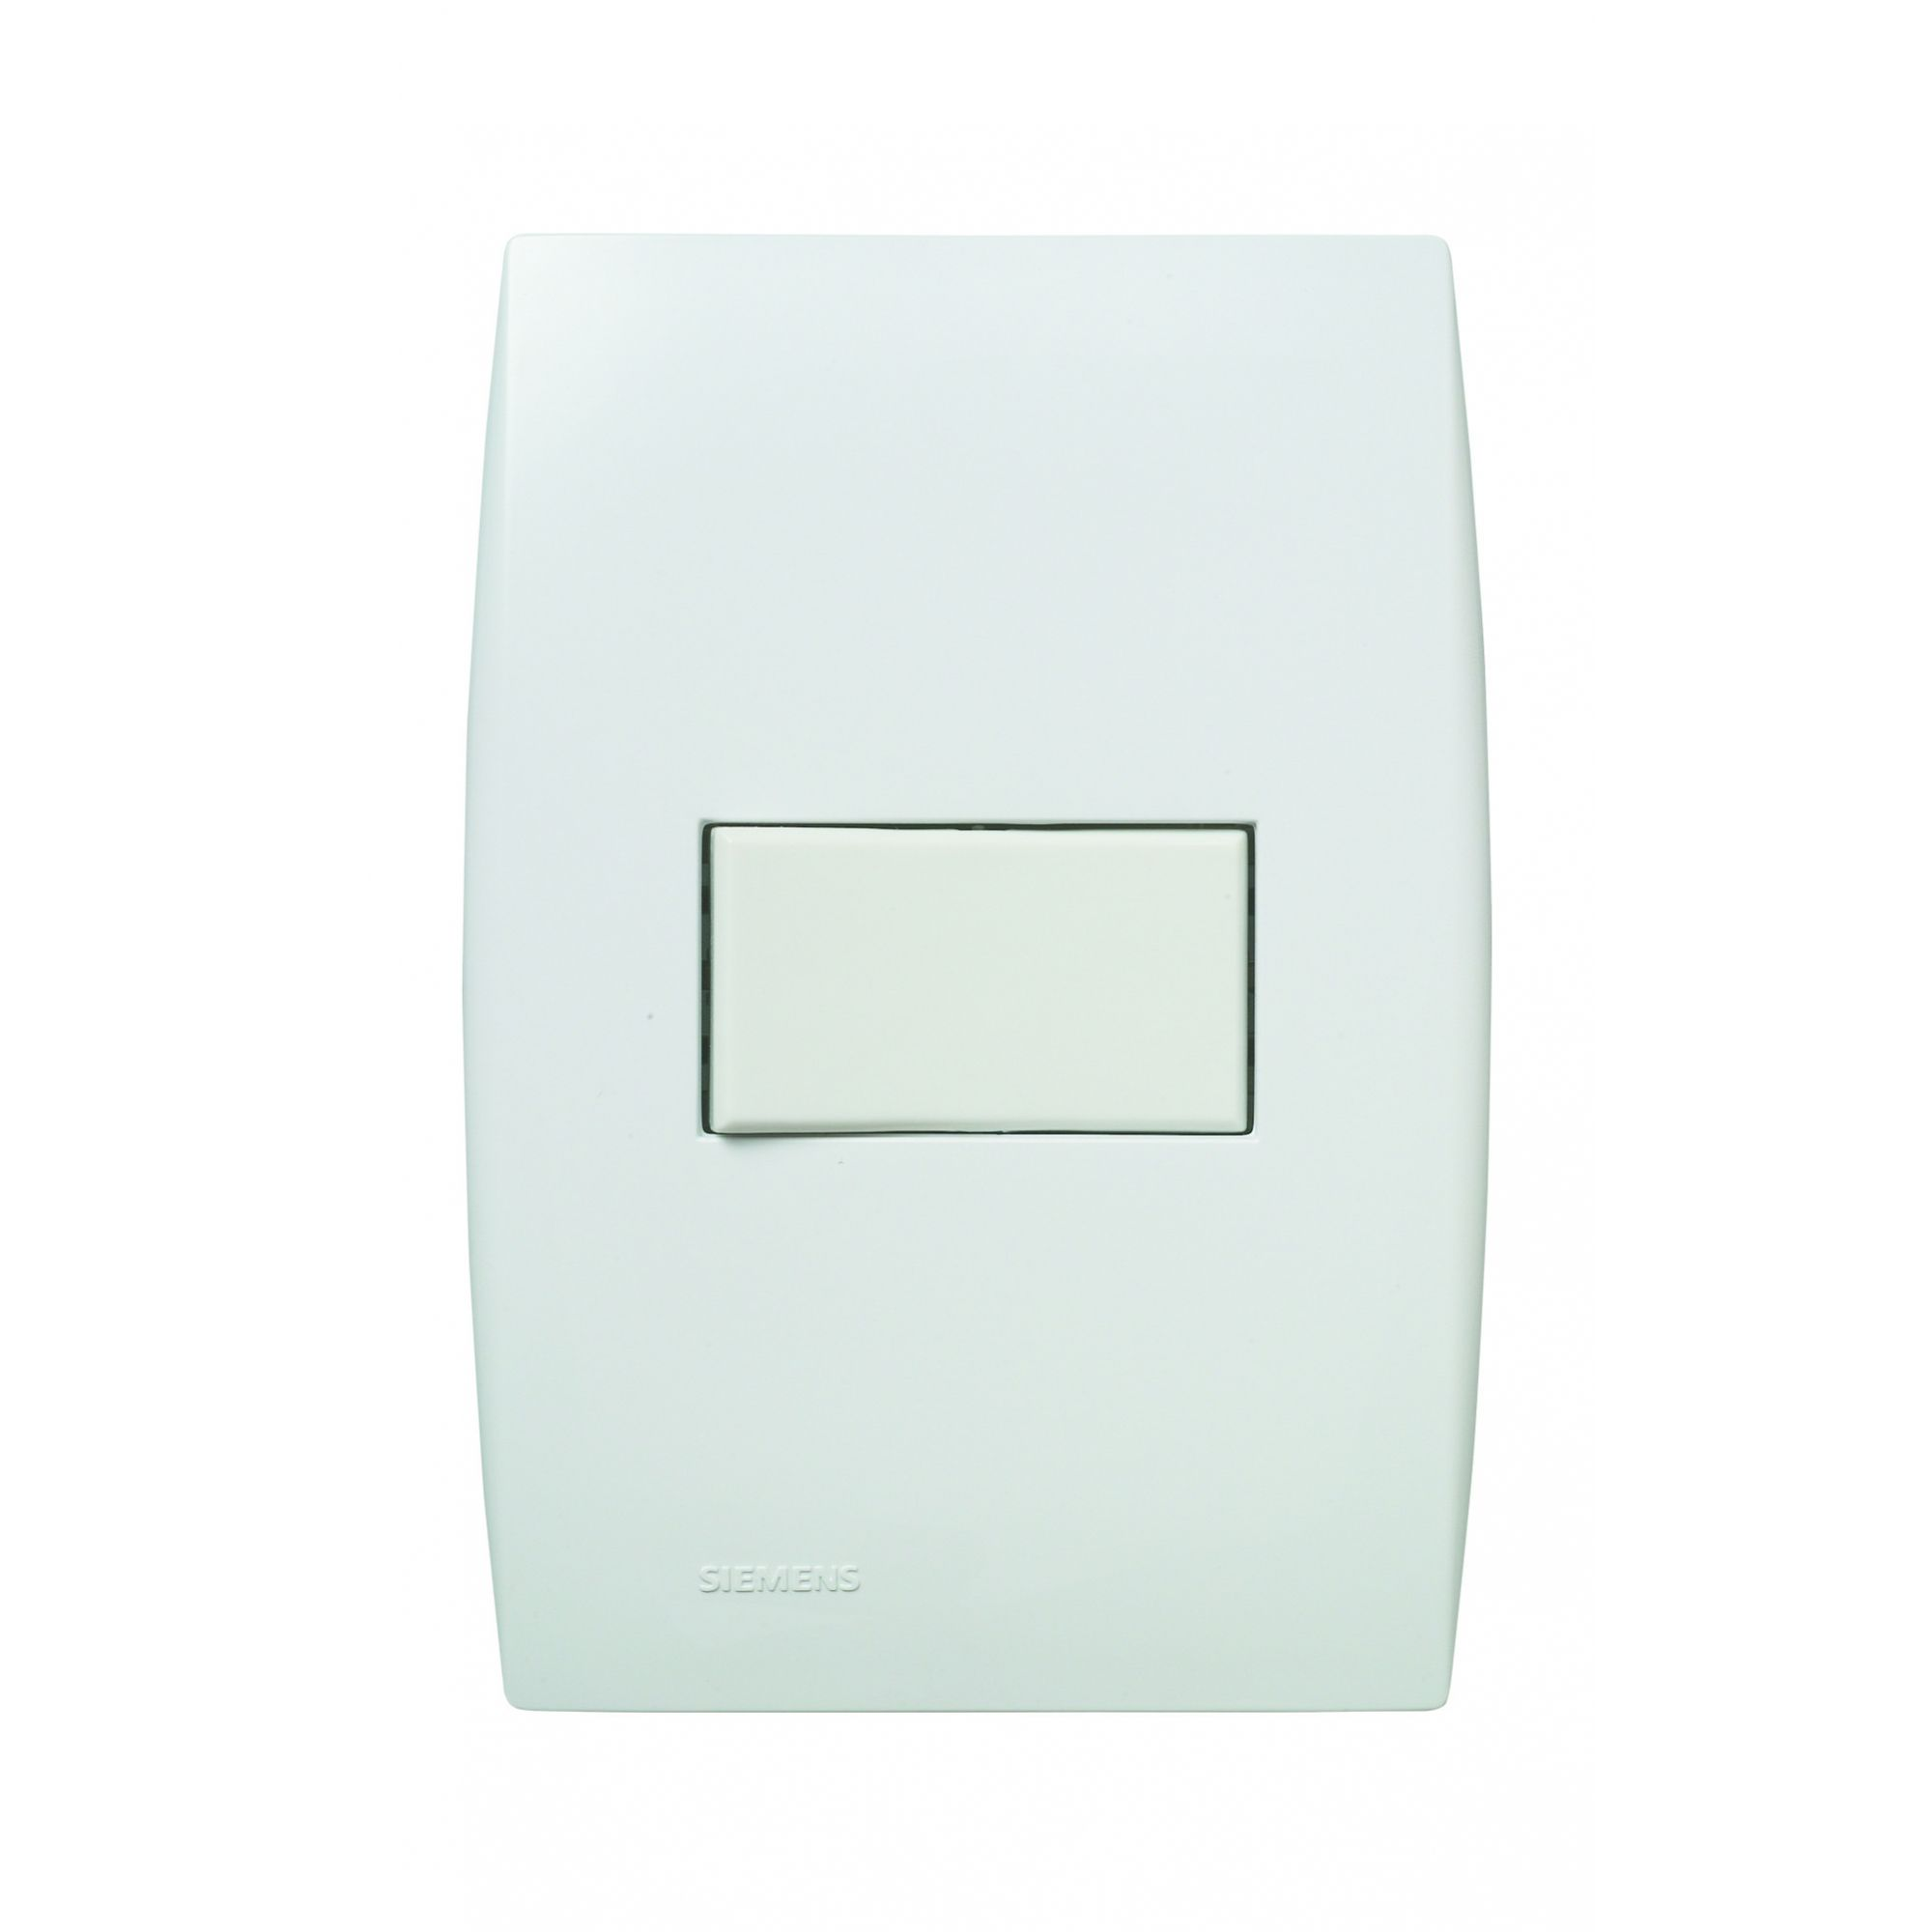 Interruptor Simples (Horizontal) – Ilus 5TA9 9040 - Siemens